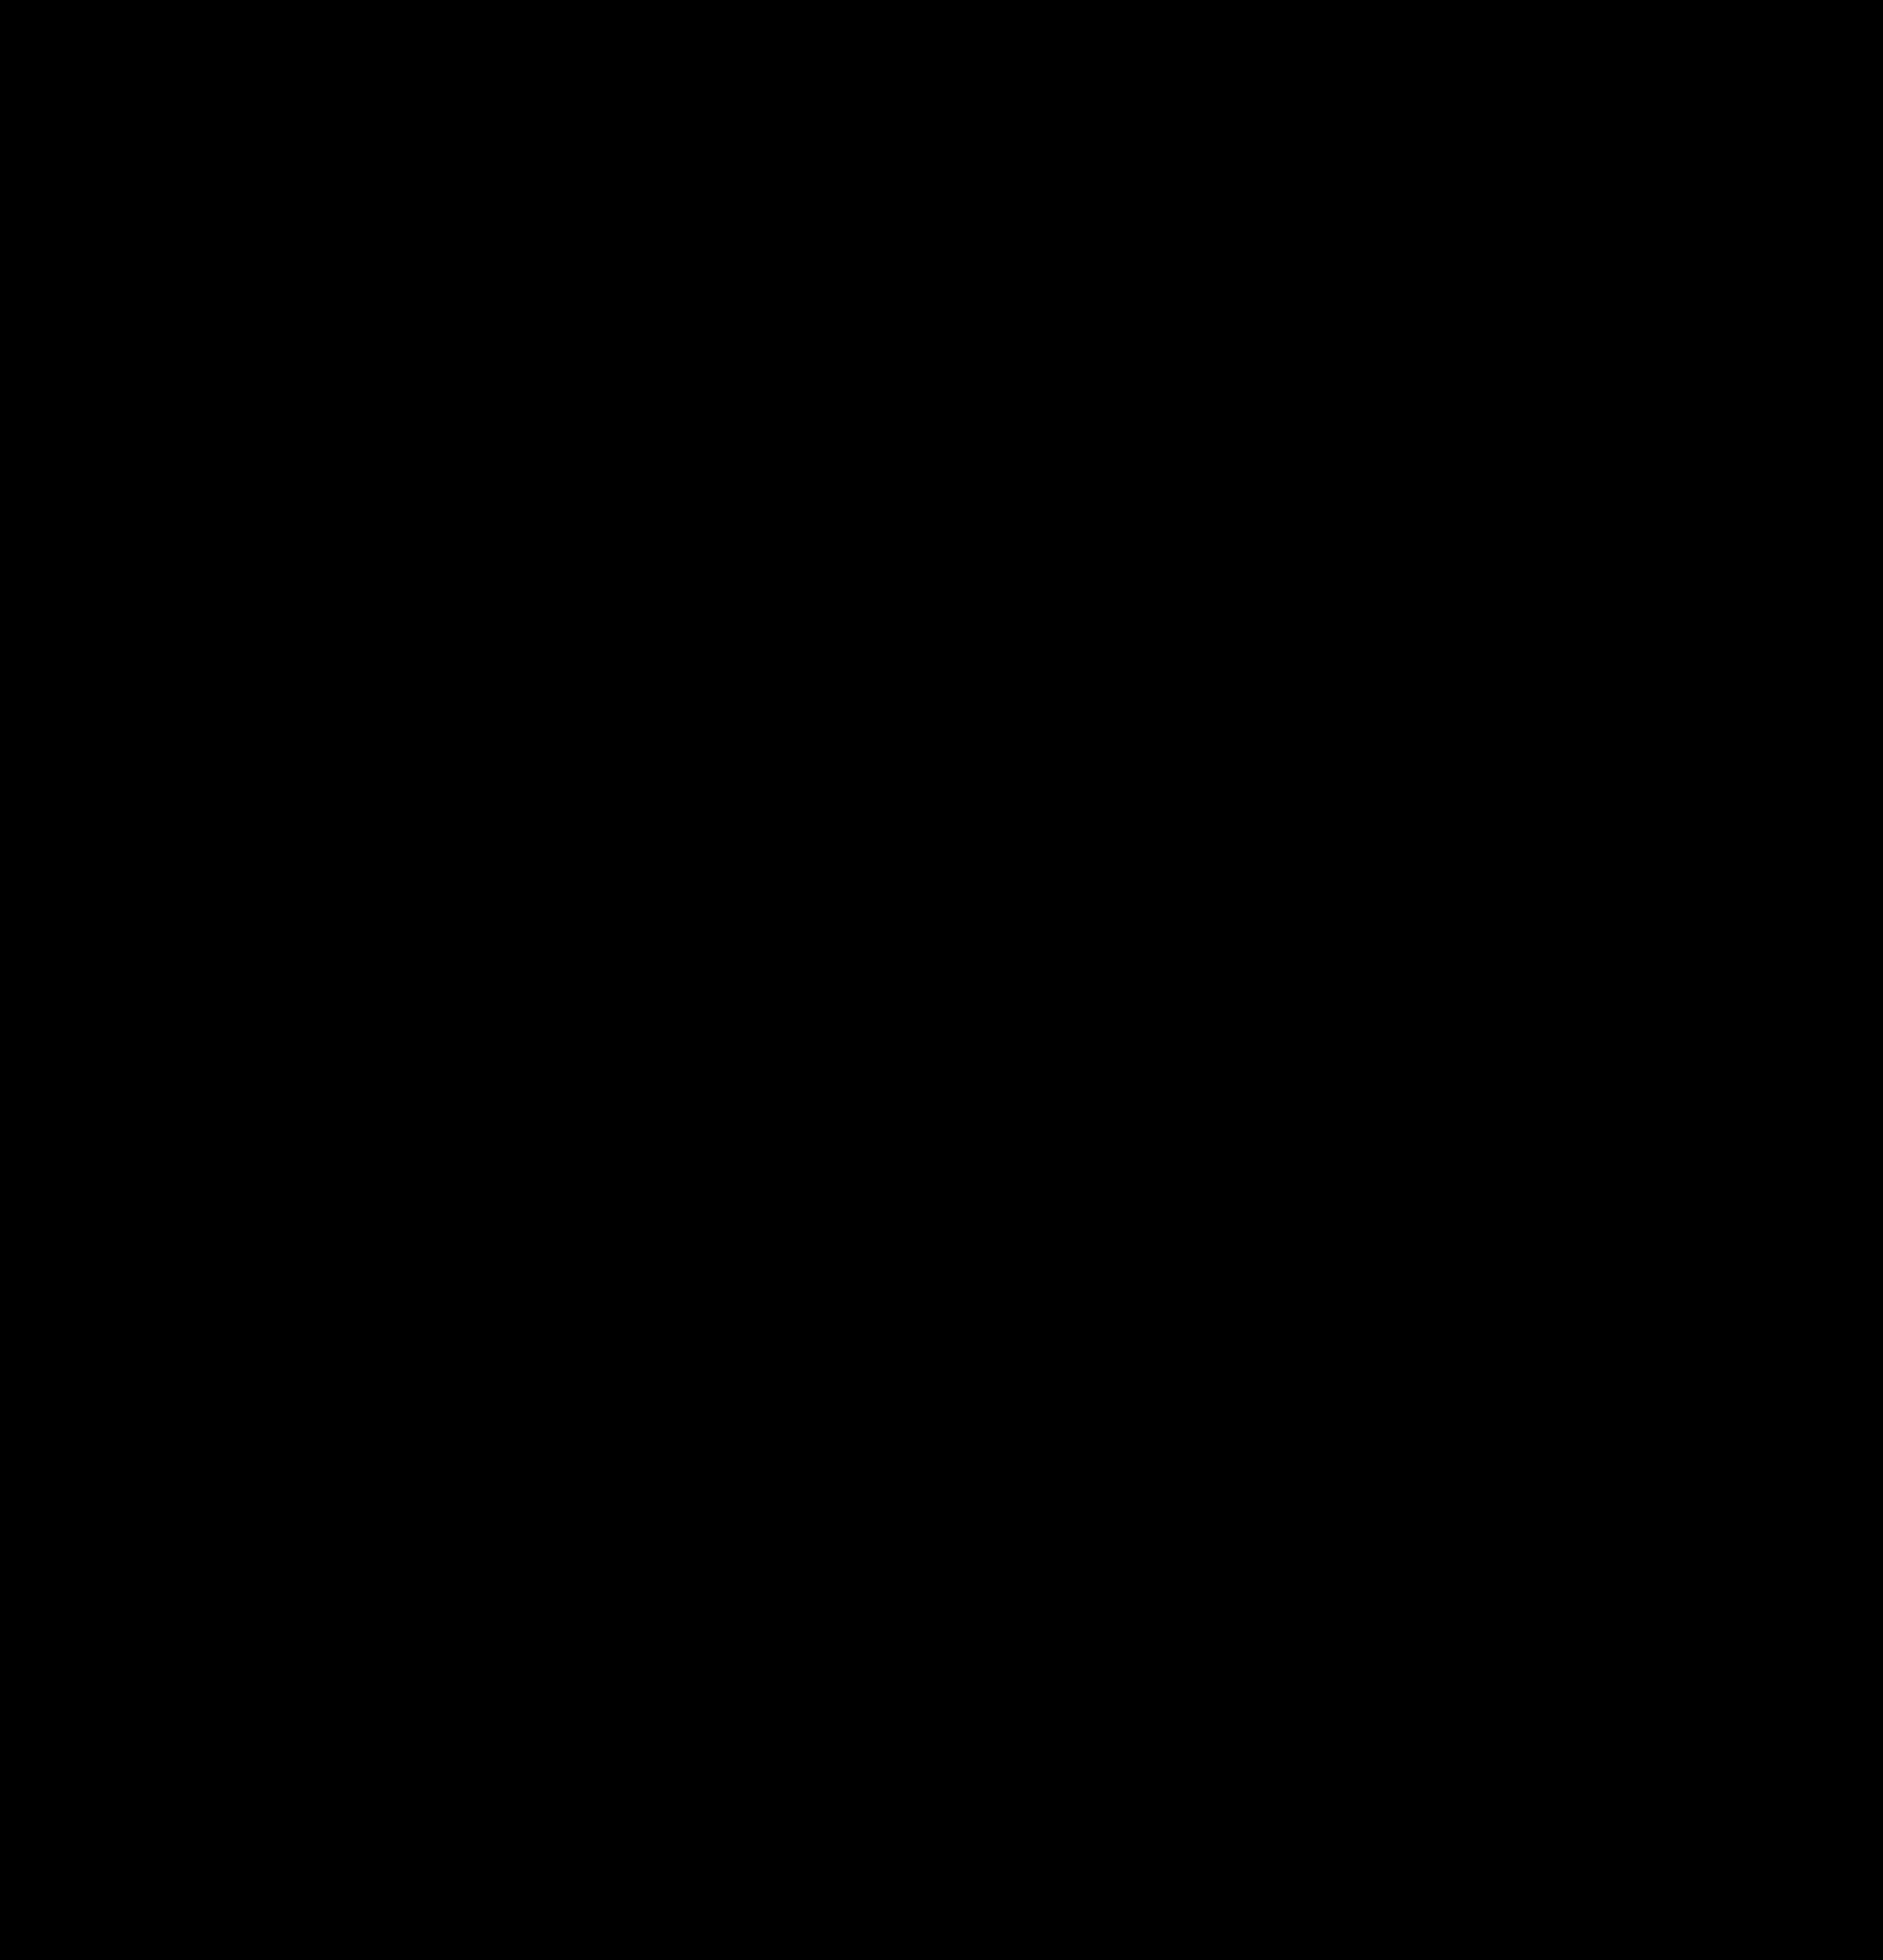 2155x2243 Clipart